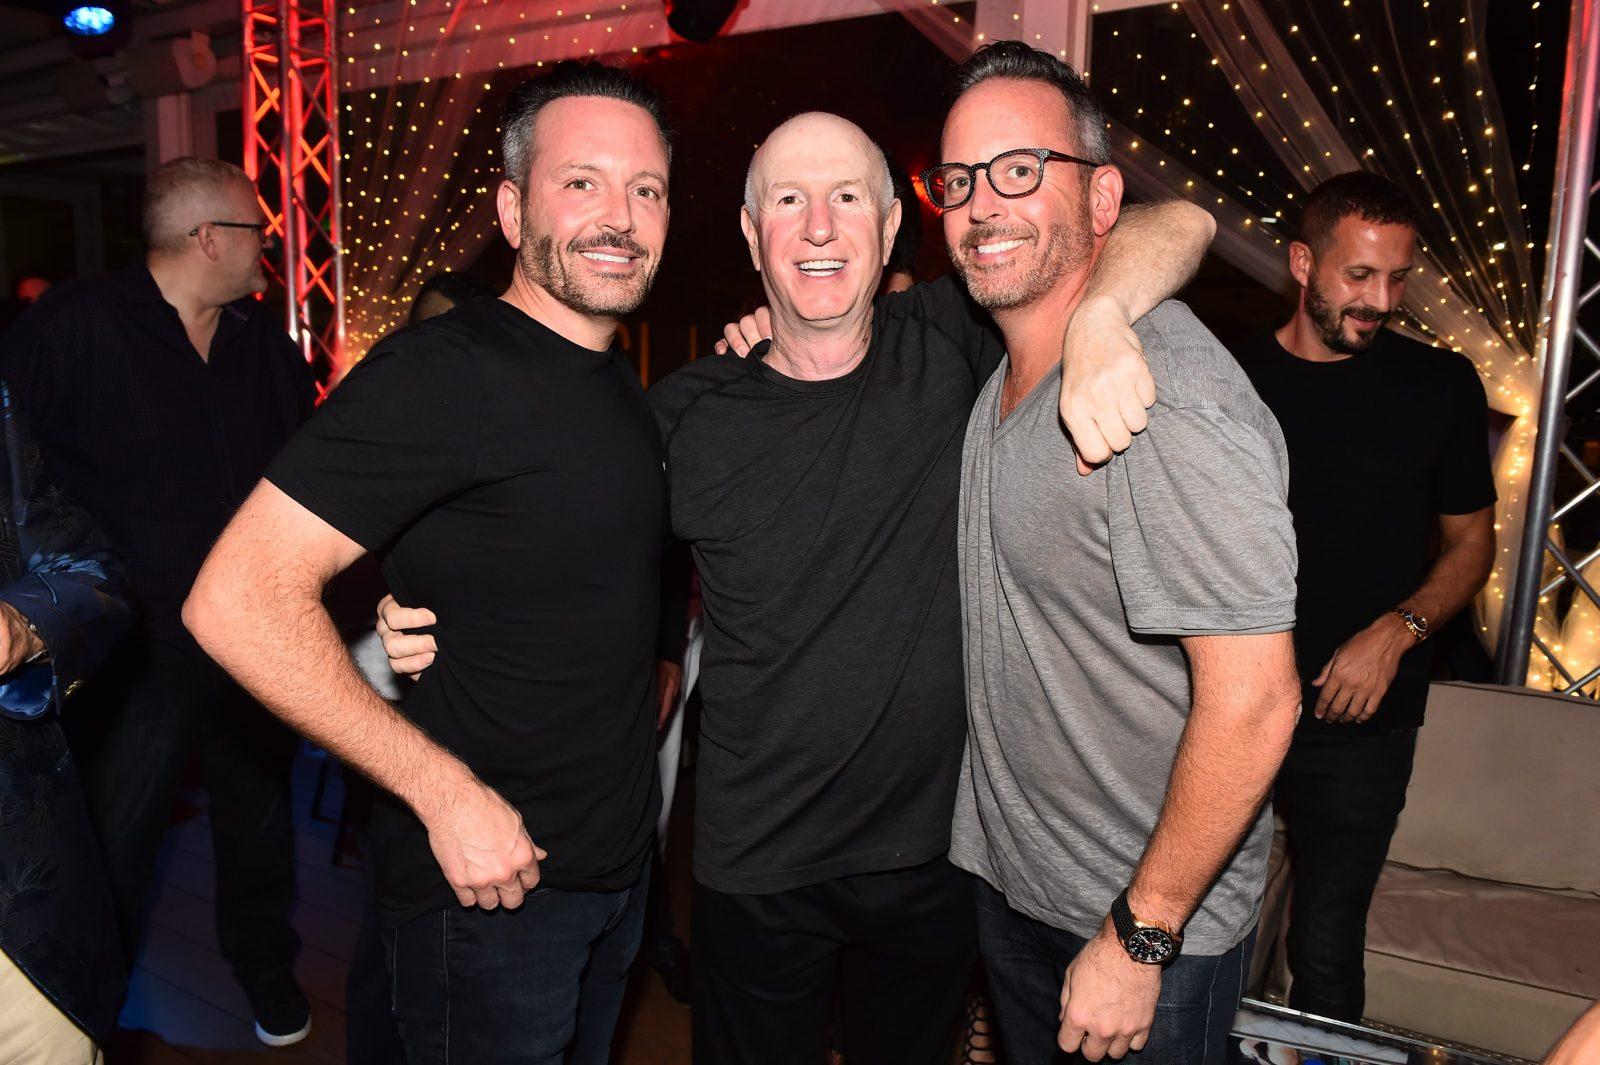 Brent Saunders, Marc Roberts, Wayne Saunders